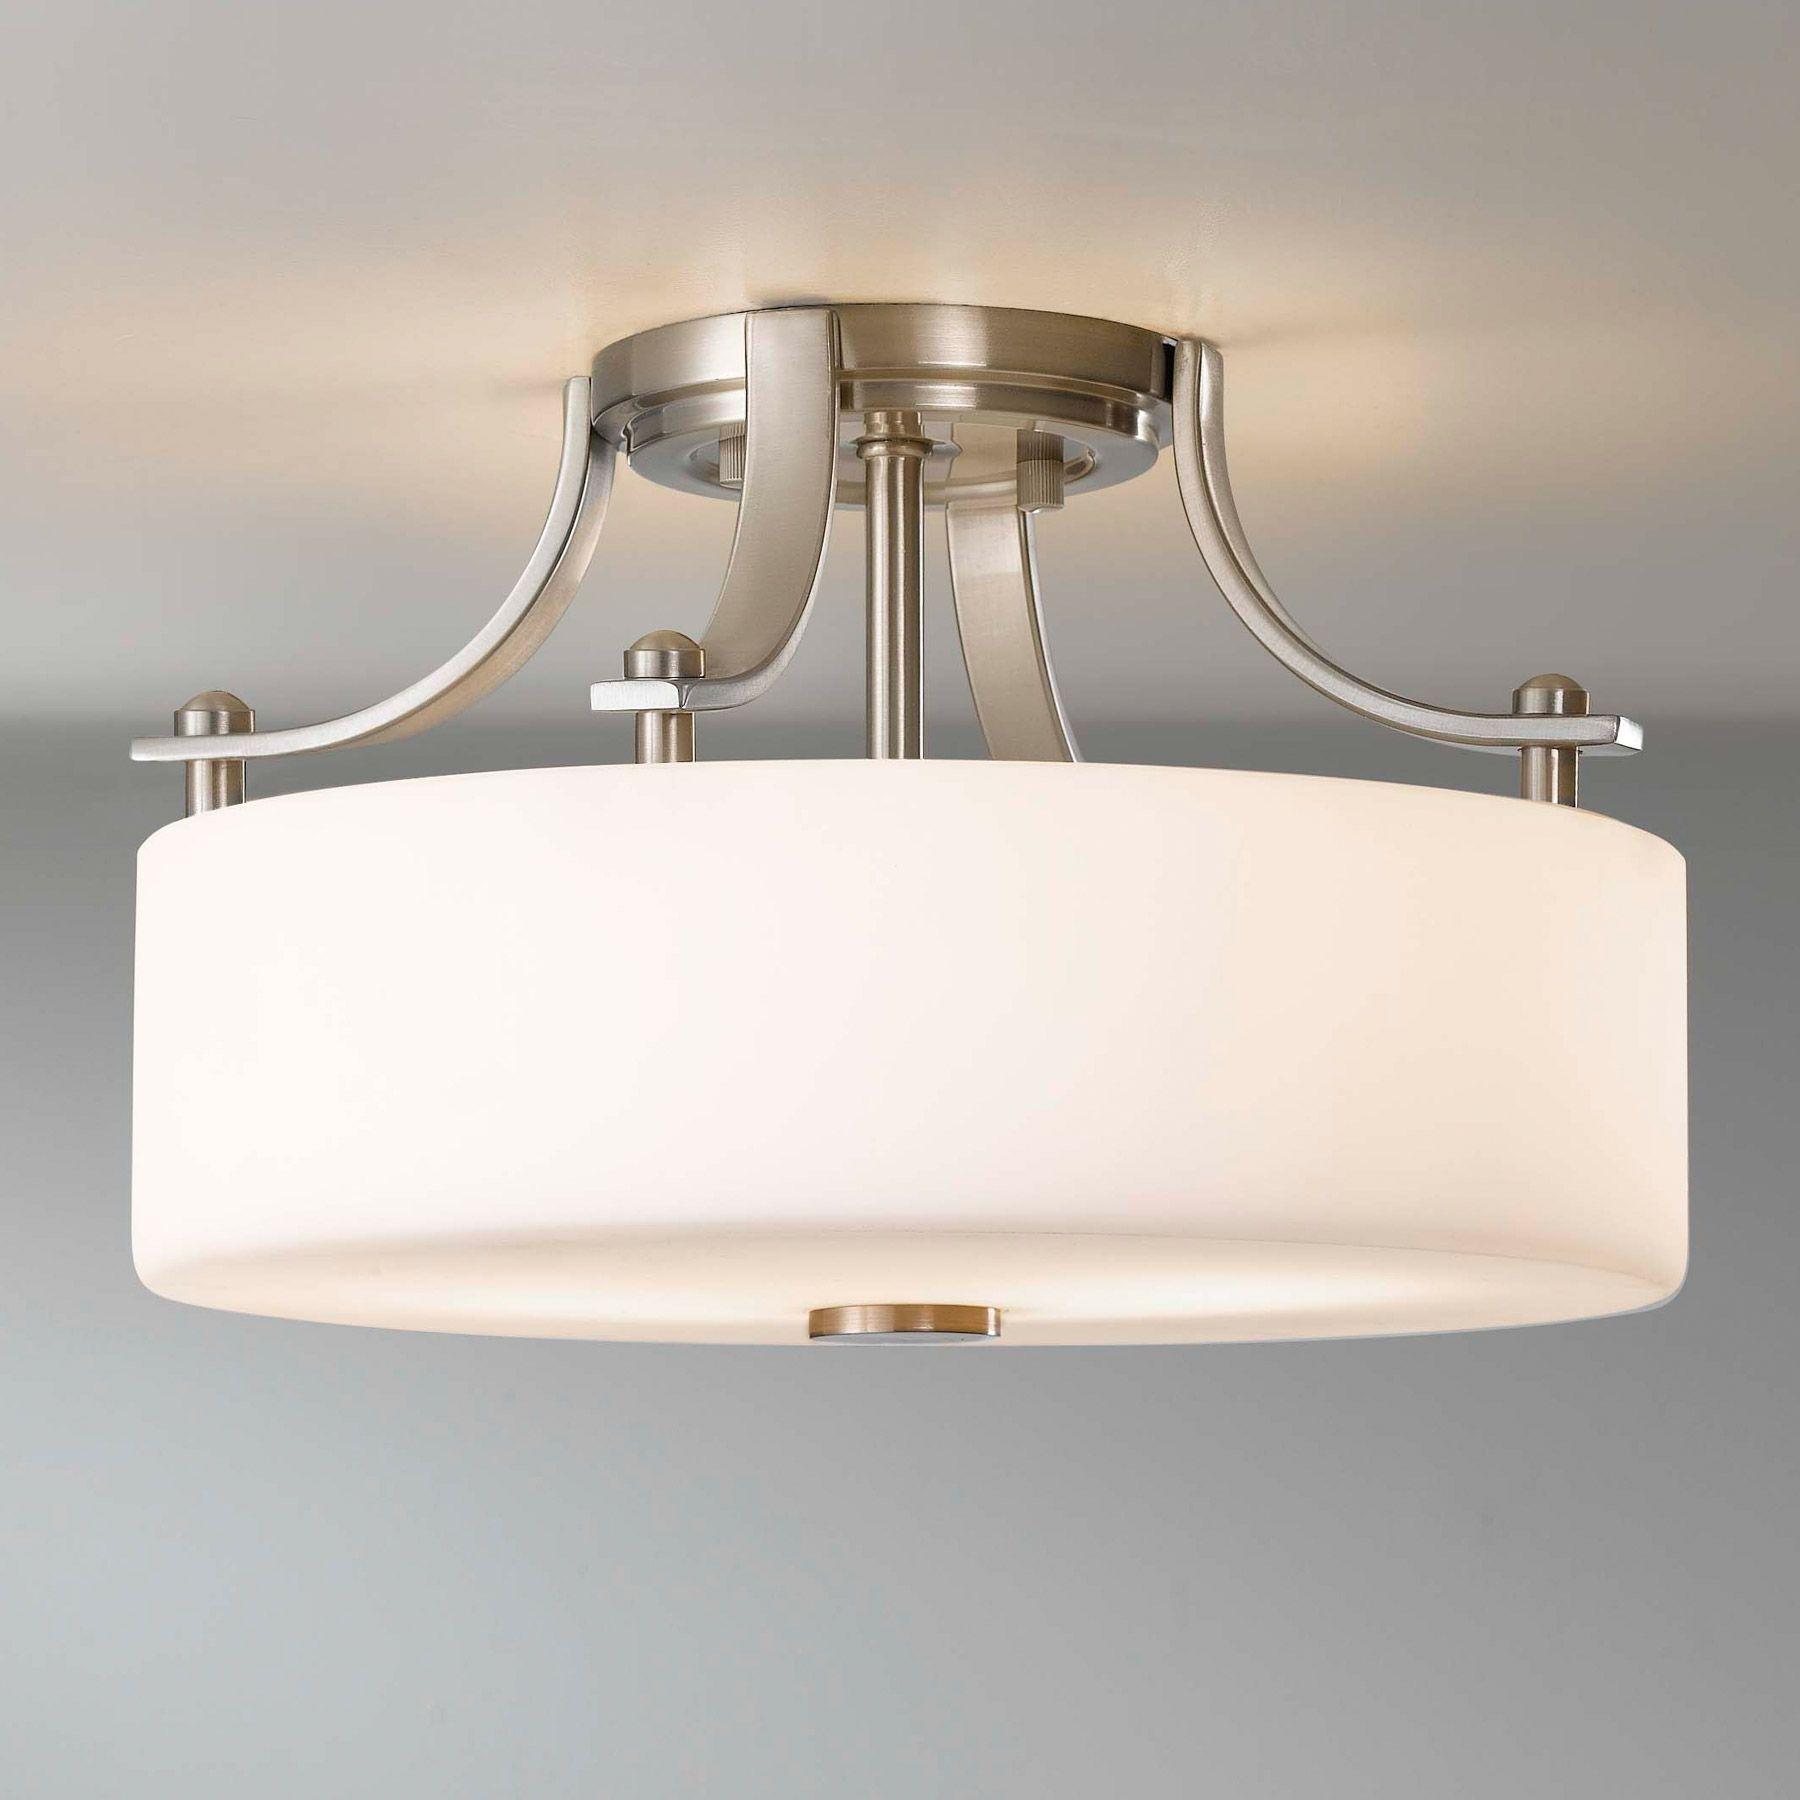 kitchen ceiling lights Ceiling lighting